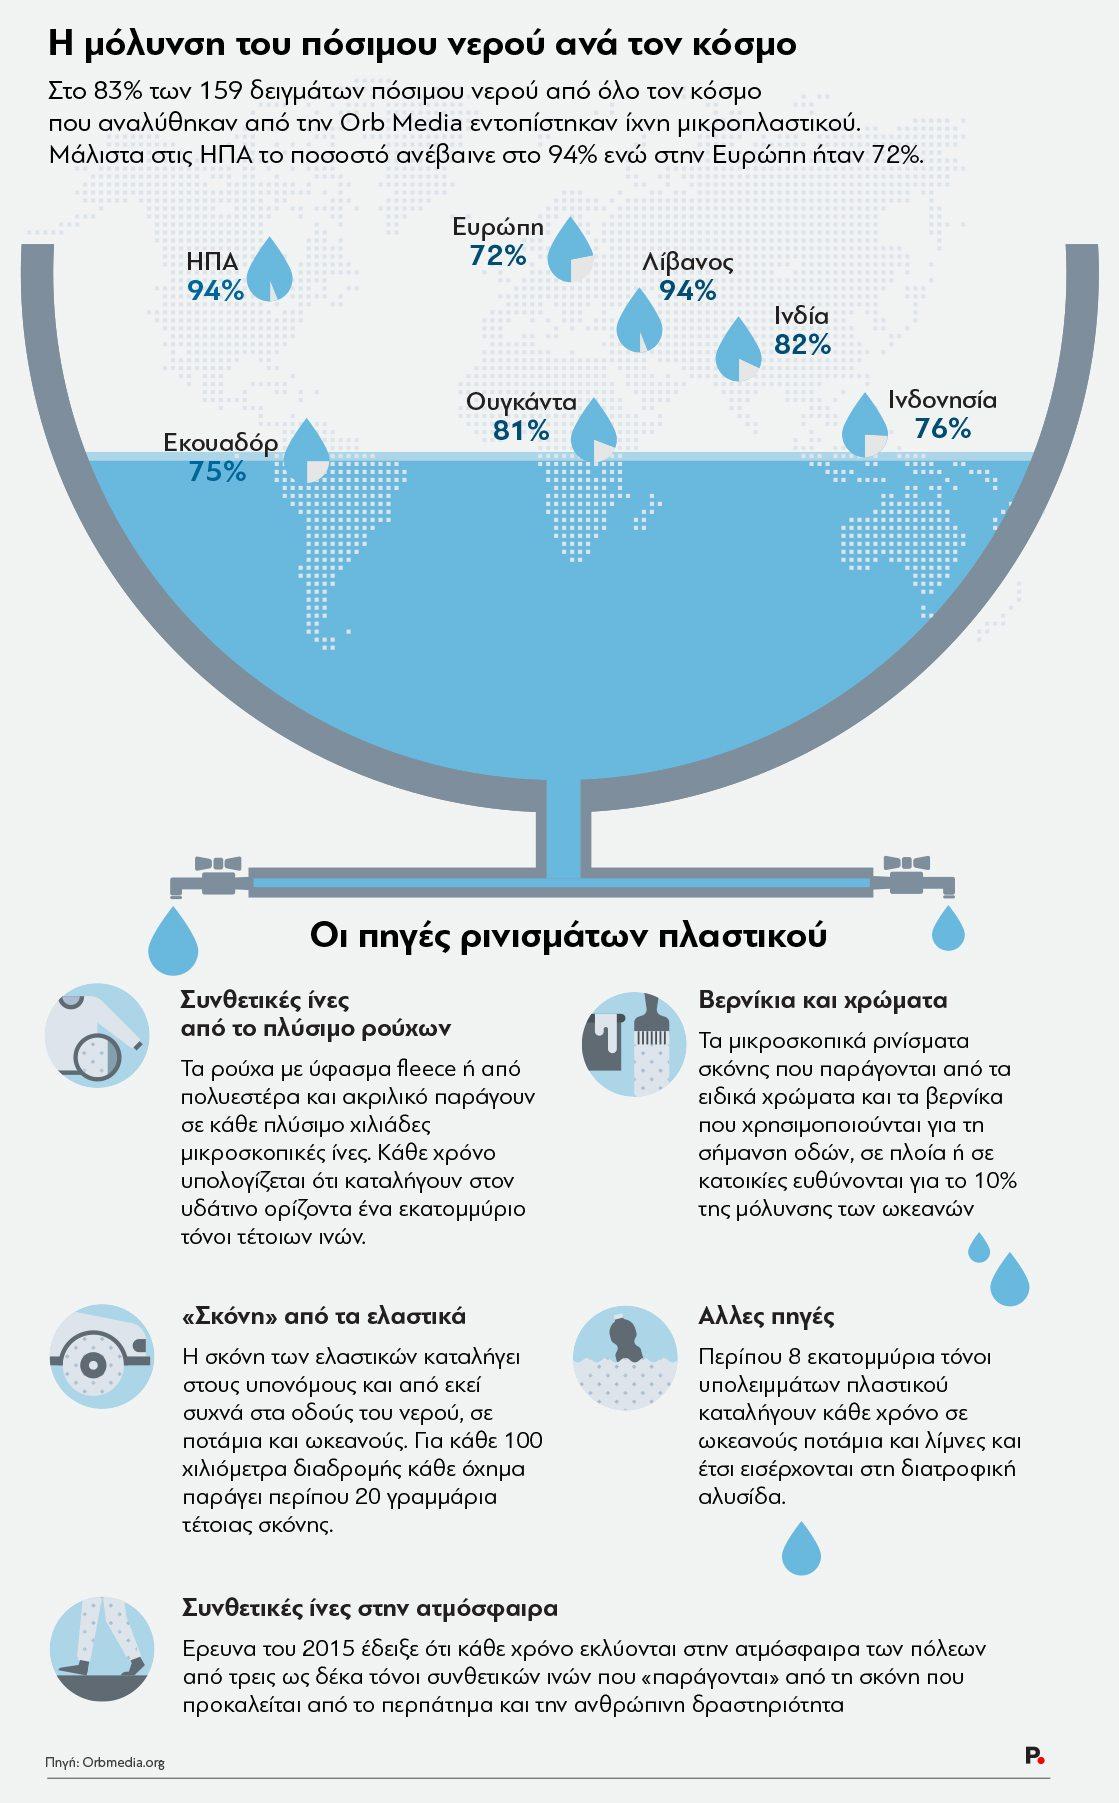 Water_Plastic_polution-1_Protagon